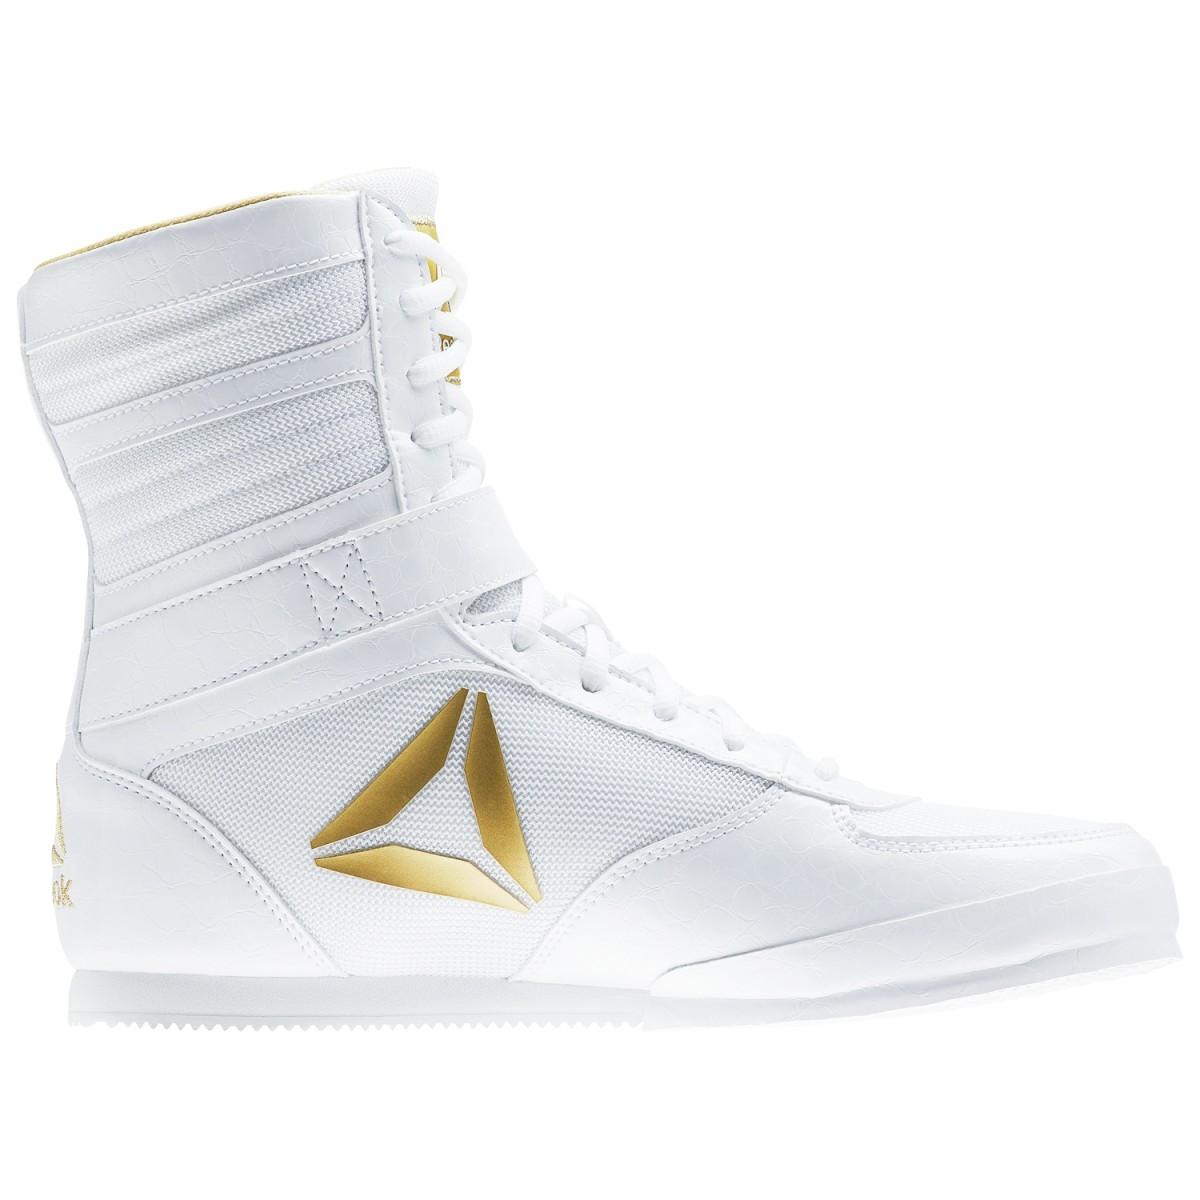 74c07fd3f507 Reebok Renegade Pro Boxing Boots - White Gold